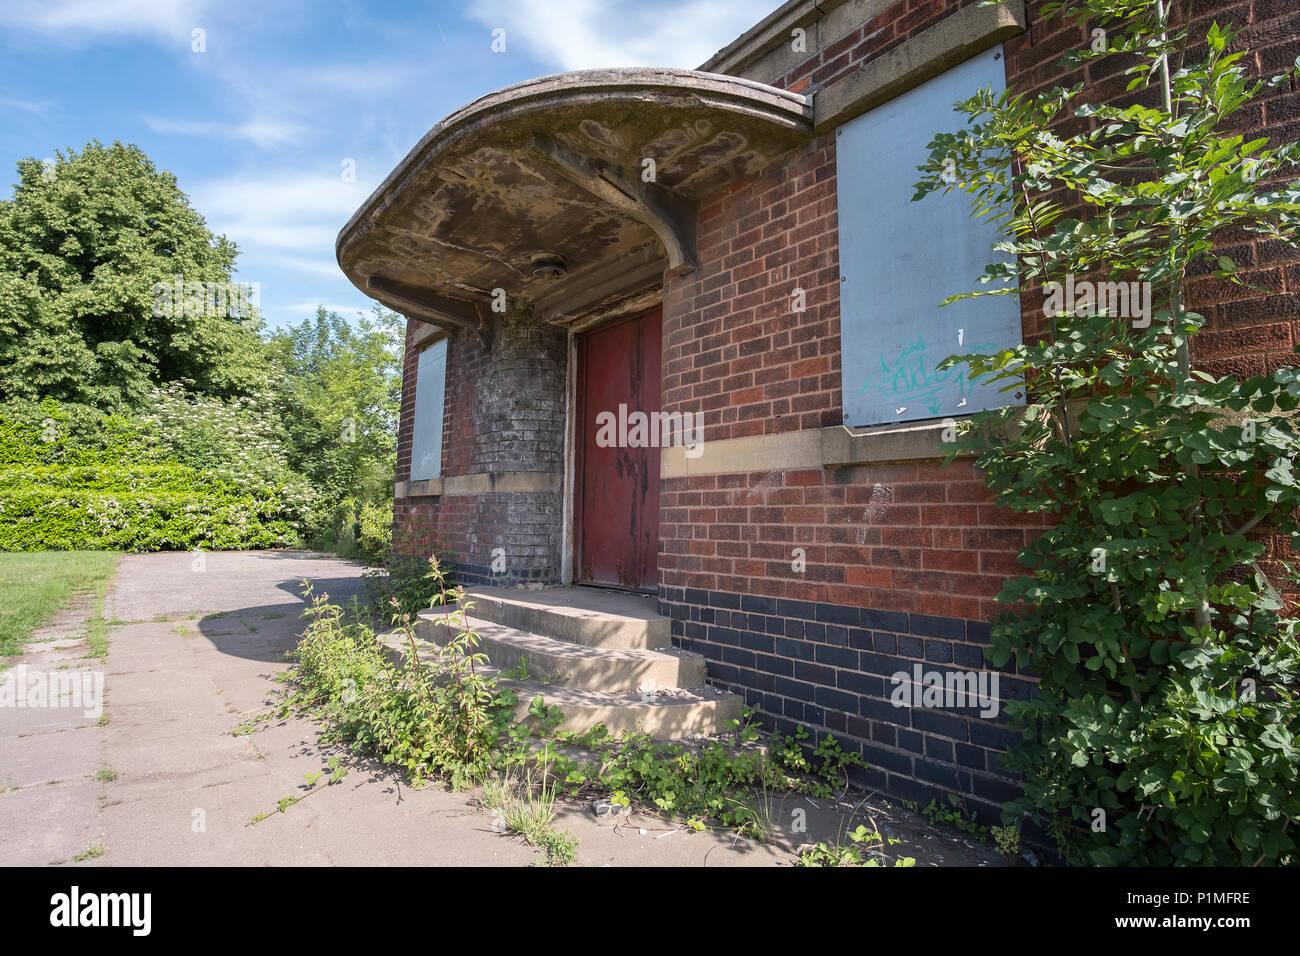 Abandoned buildings at Stanton Ironworks, Derbyshire, UK Stock Photo